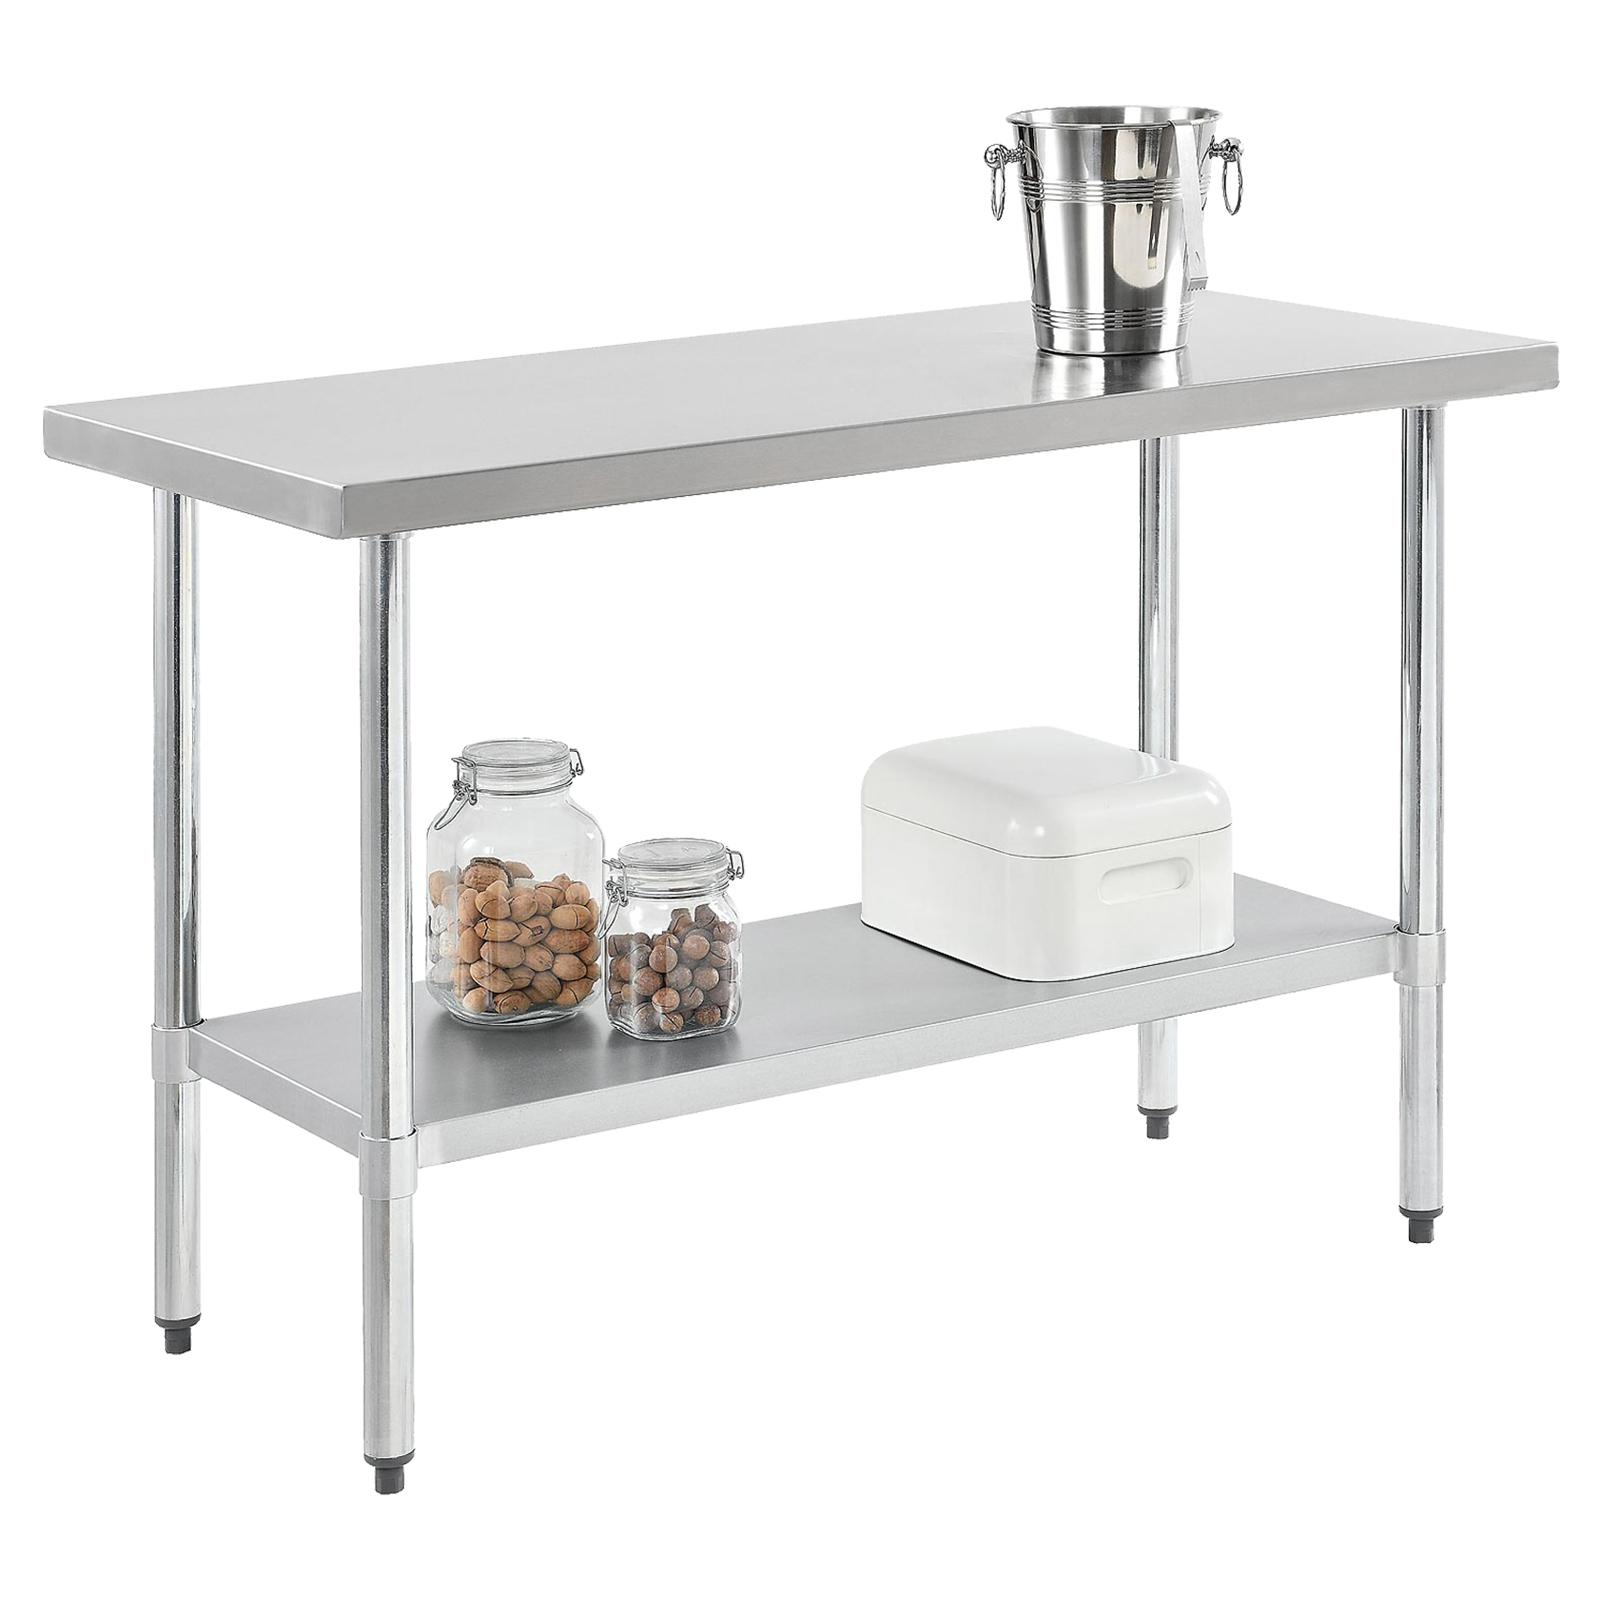 NEXEL WB9630SS work table,  85